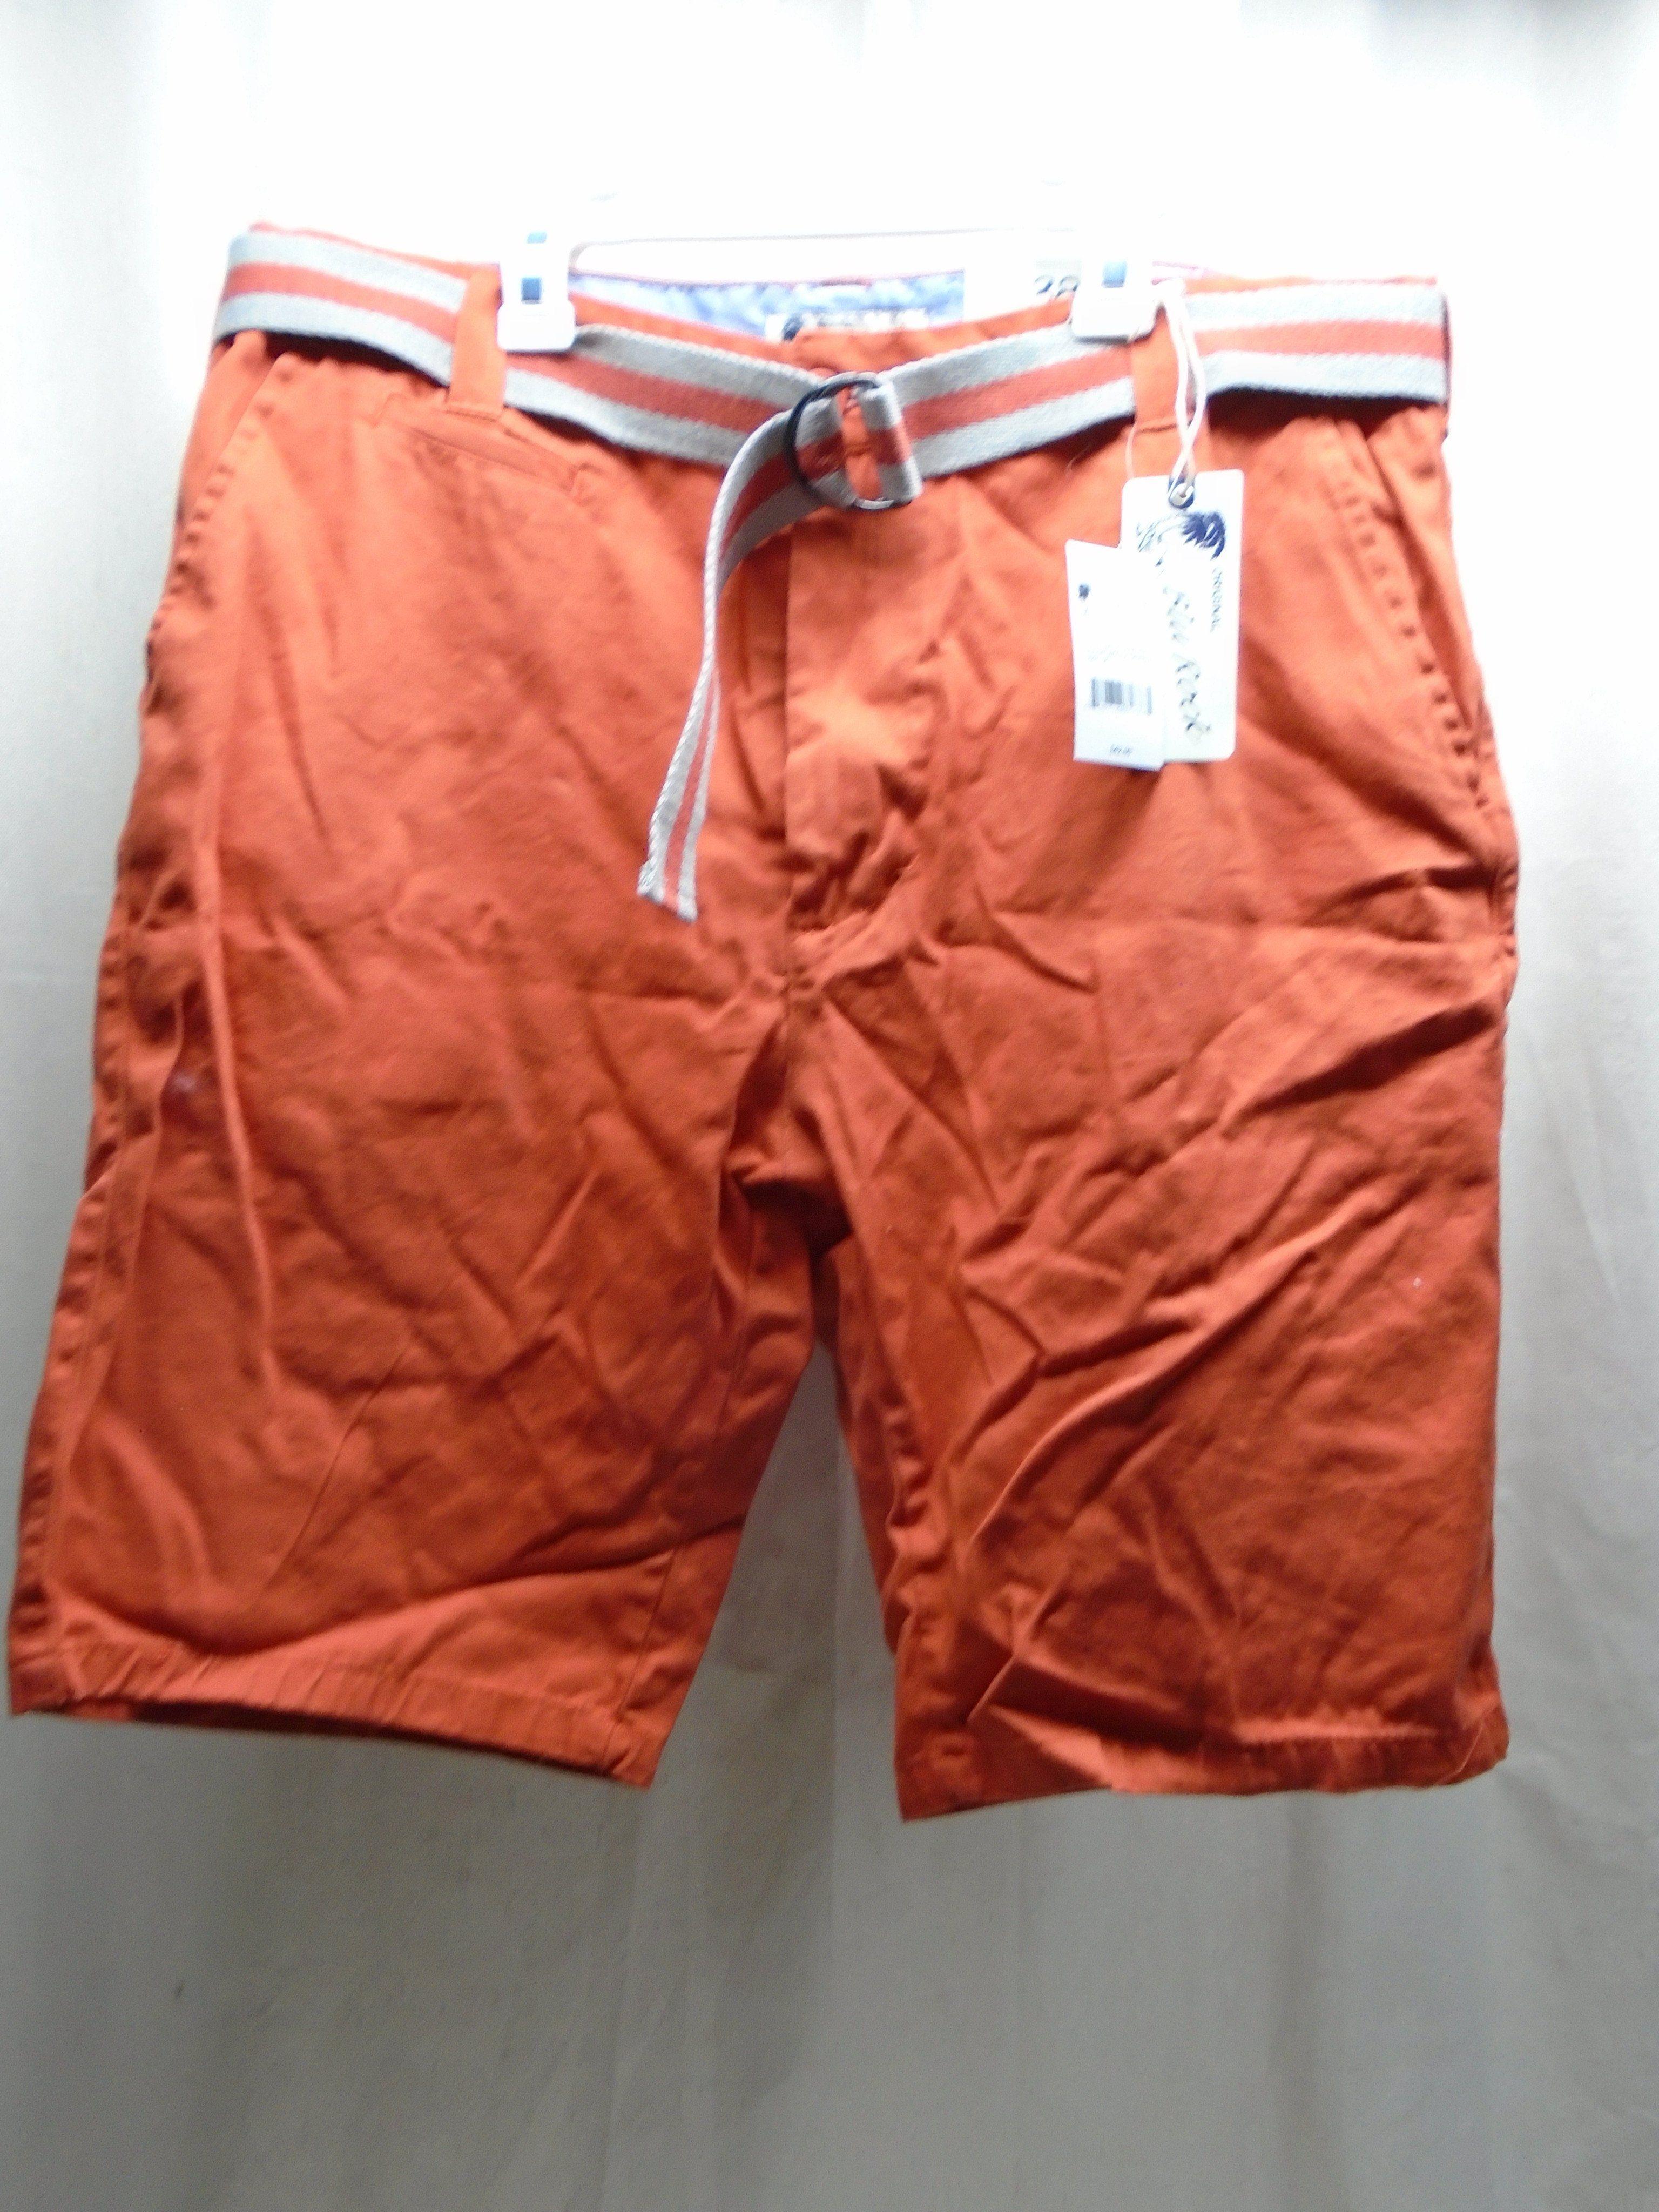 010d05c833 NWT Original Blu Rock Premium Clothing Men's Belted Cargo Shorts Size 38  Orange